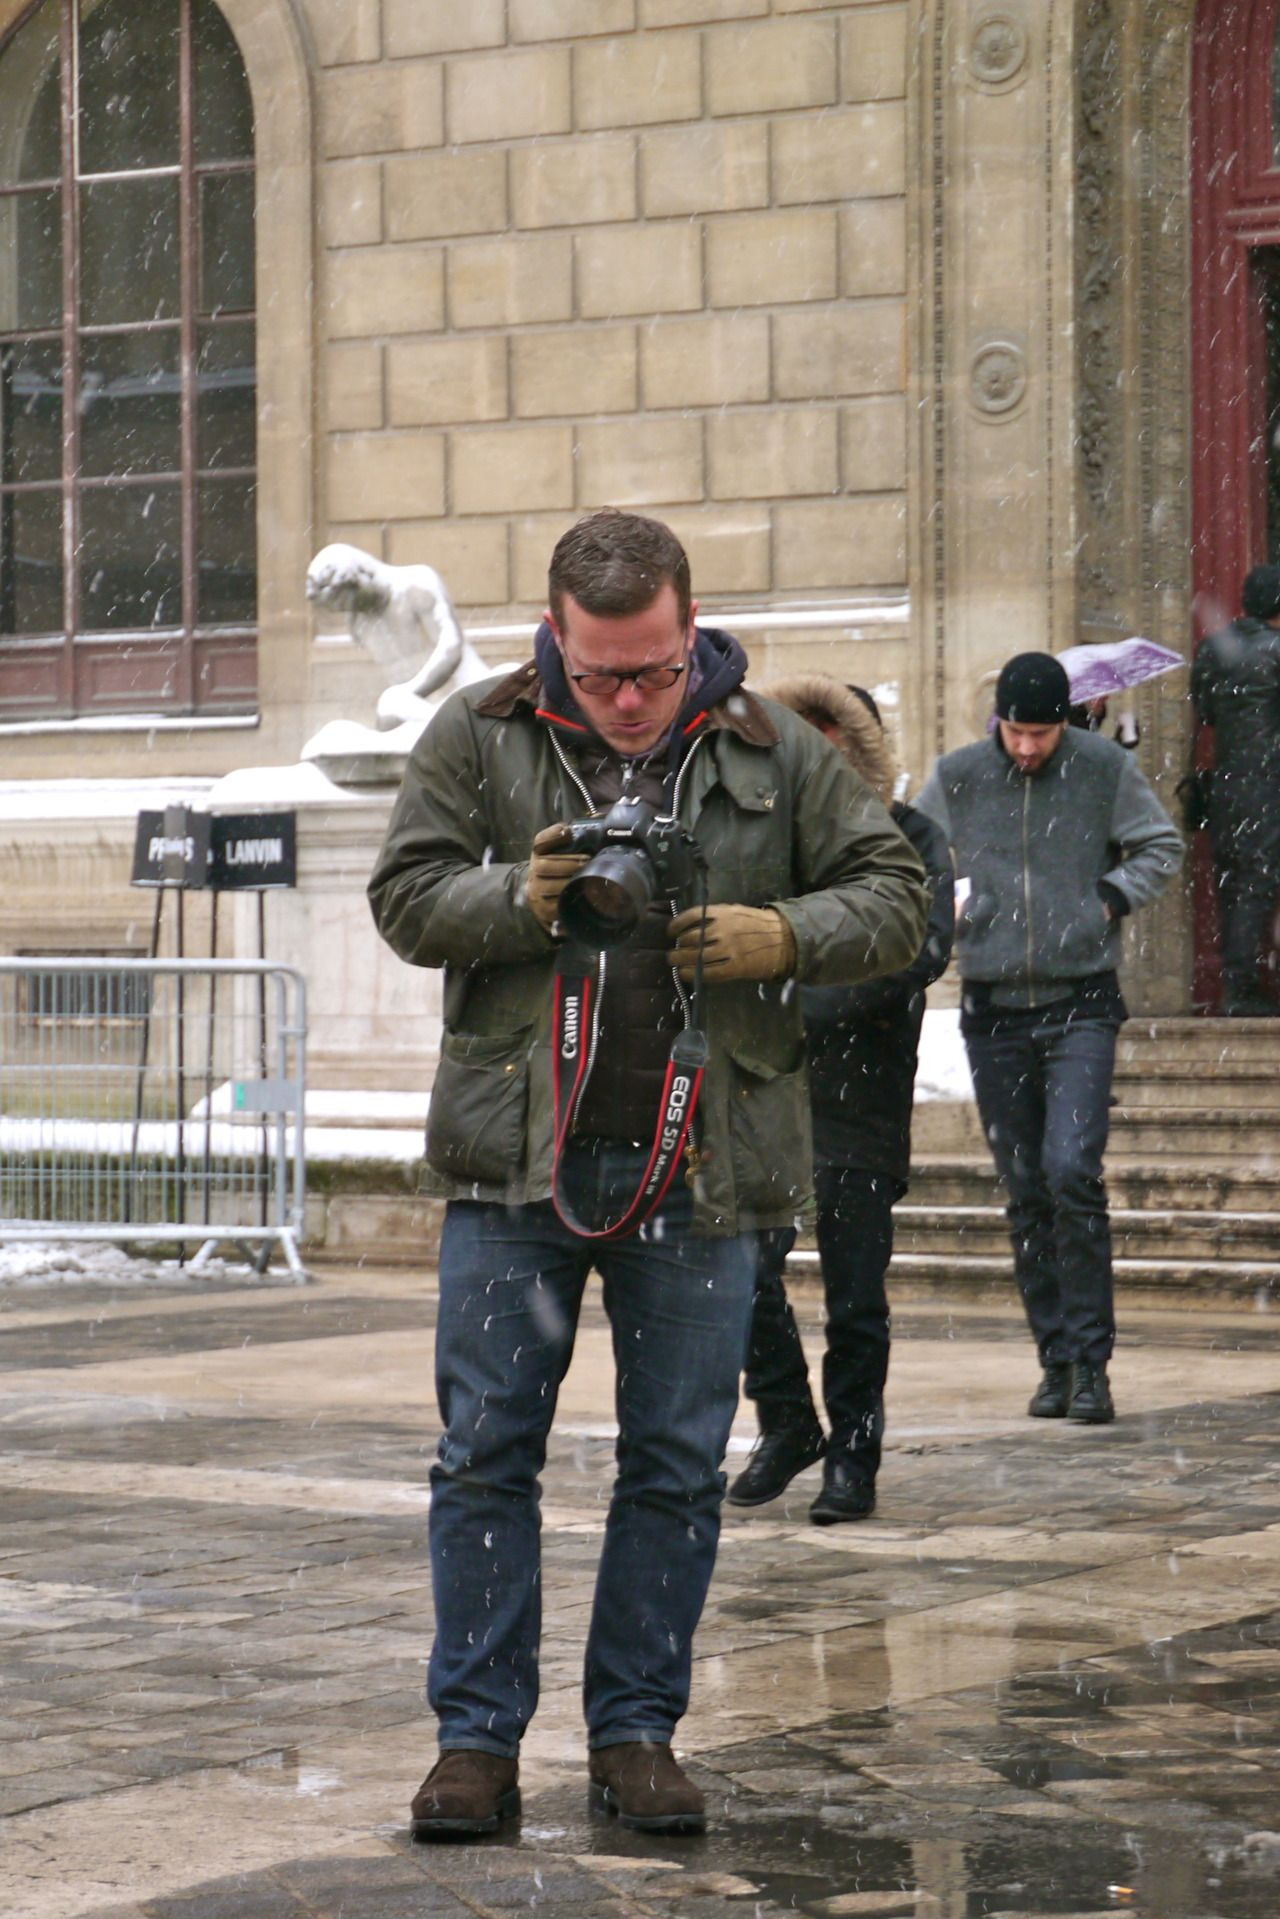 Down Jacket X Hooded Sweatshirt X Barbour Superposition By Scott Schuman Obermeyer Jacket Hooded Sweatshirts Jackets [ 1919 x 1280 Pixel ]